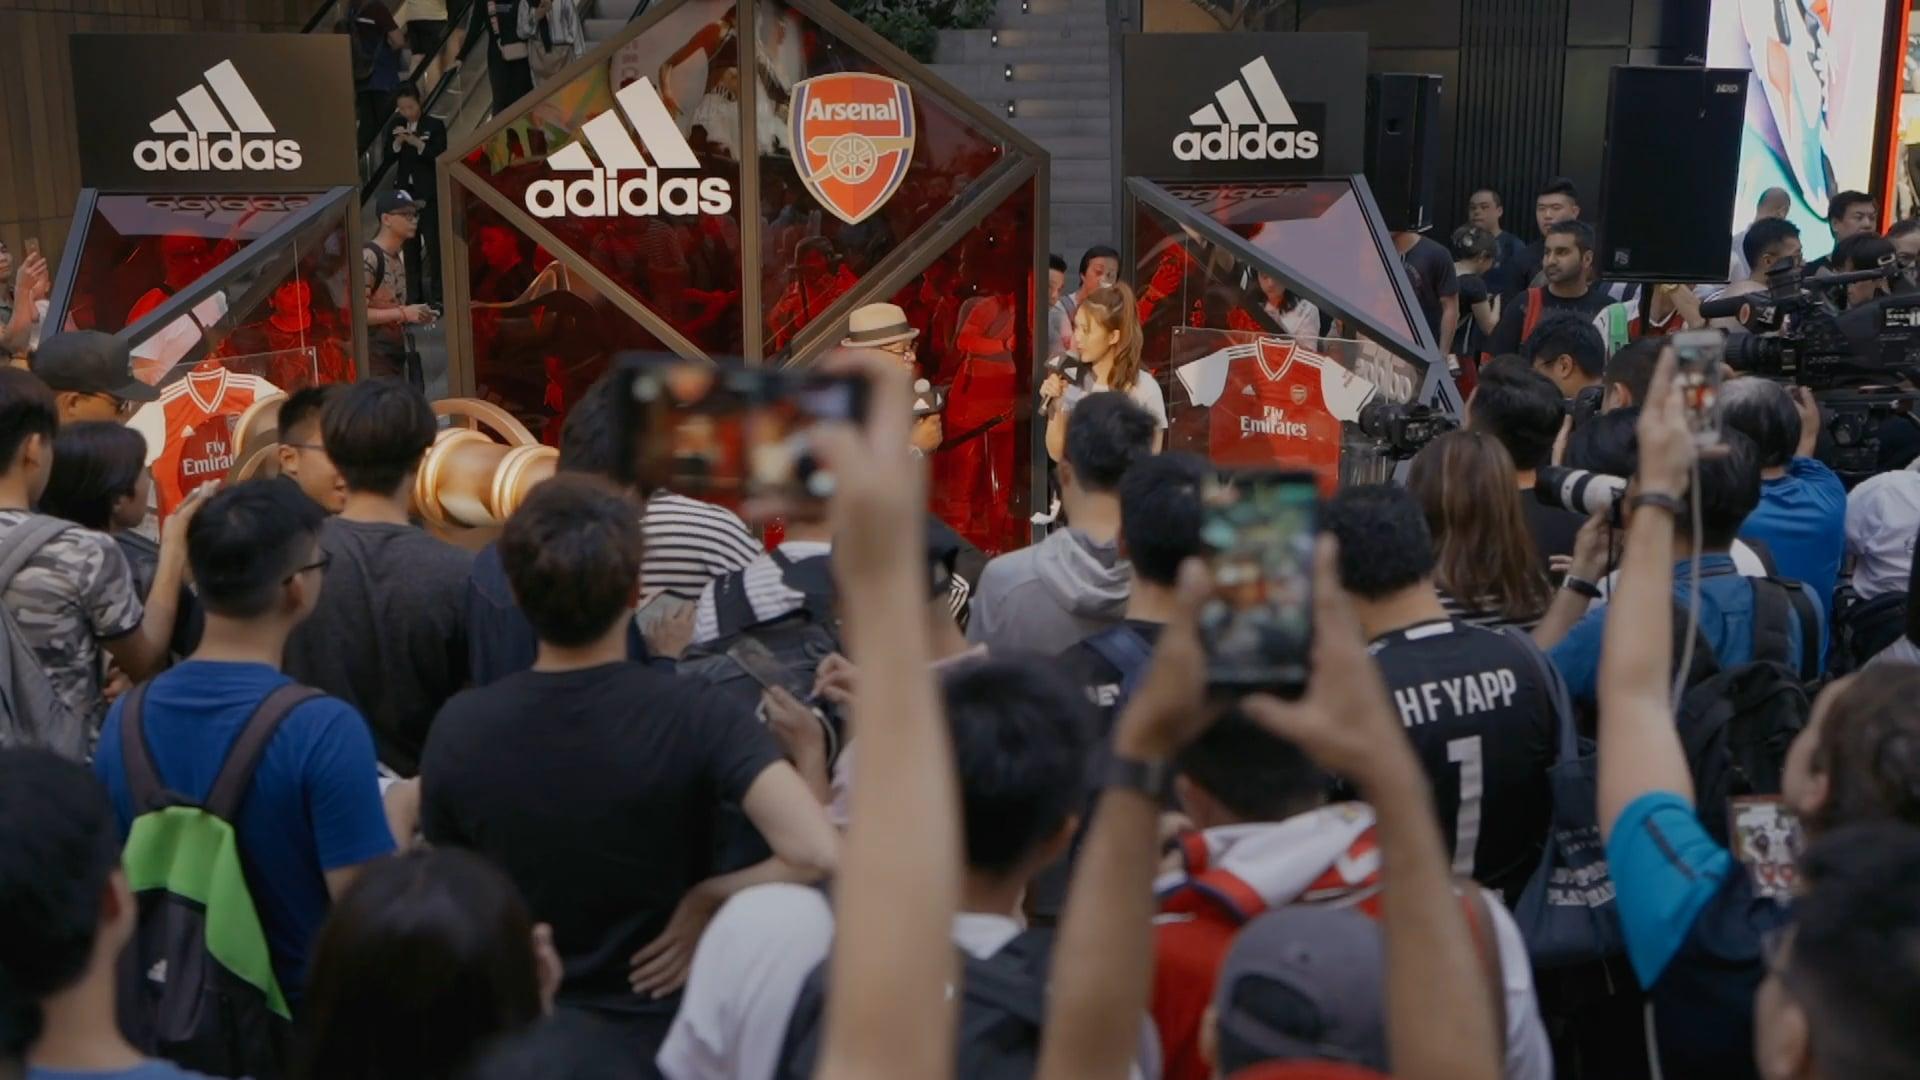 Adidas Event